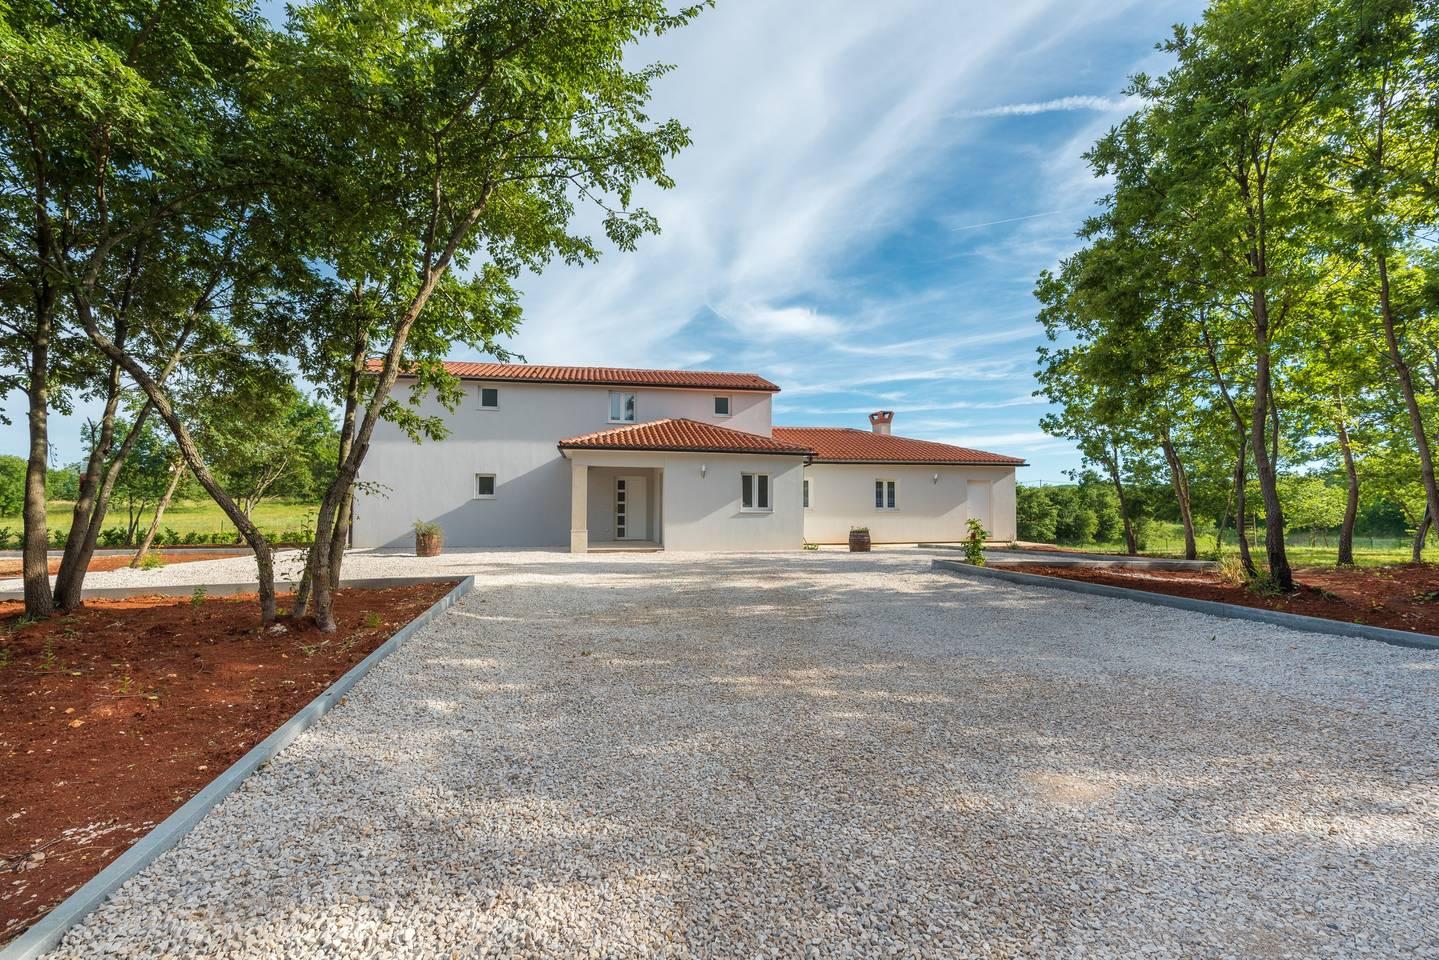 Apartment Private Villa in Sumber near Rabac photo 16812639